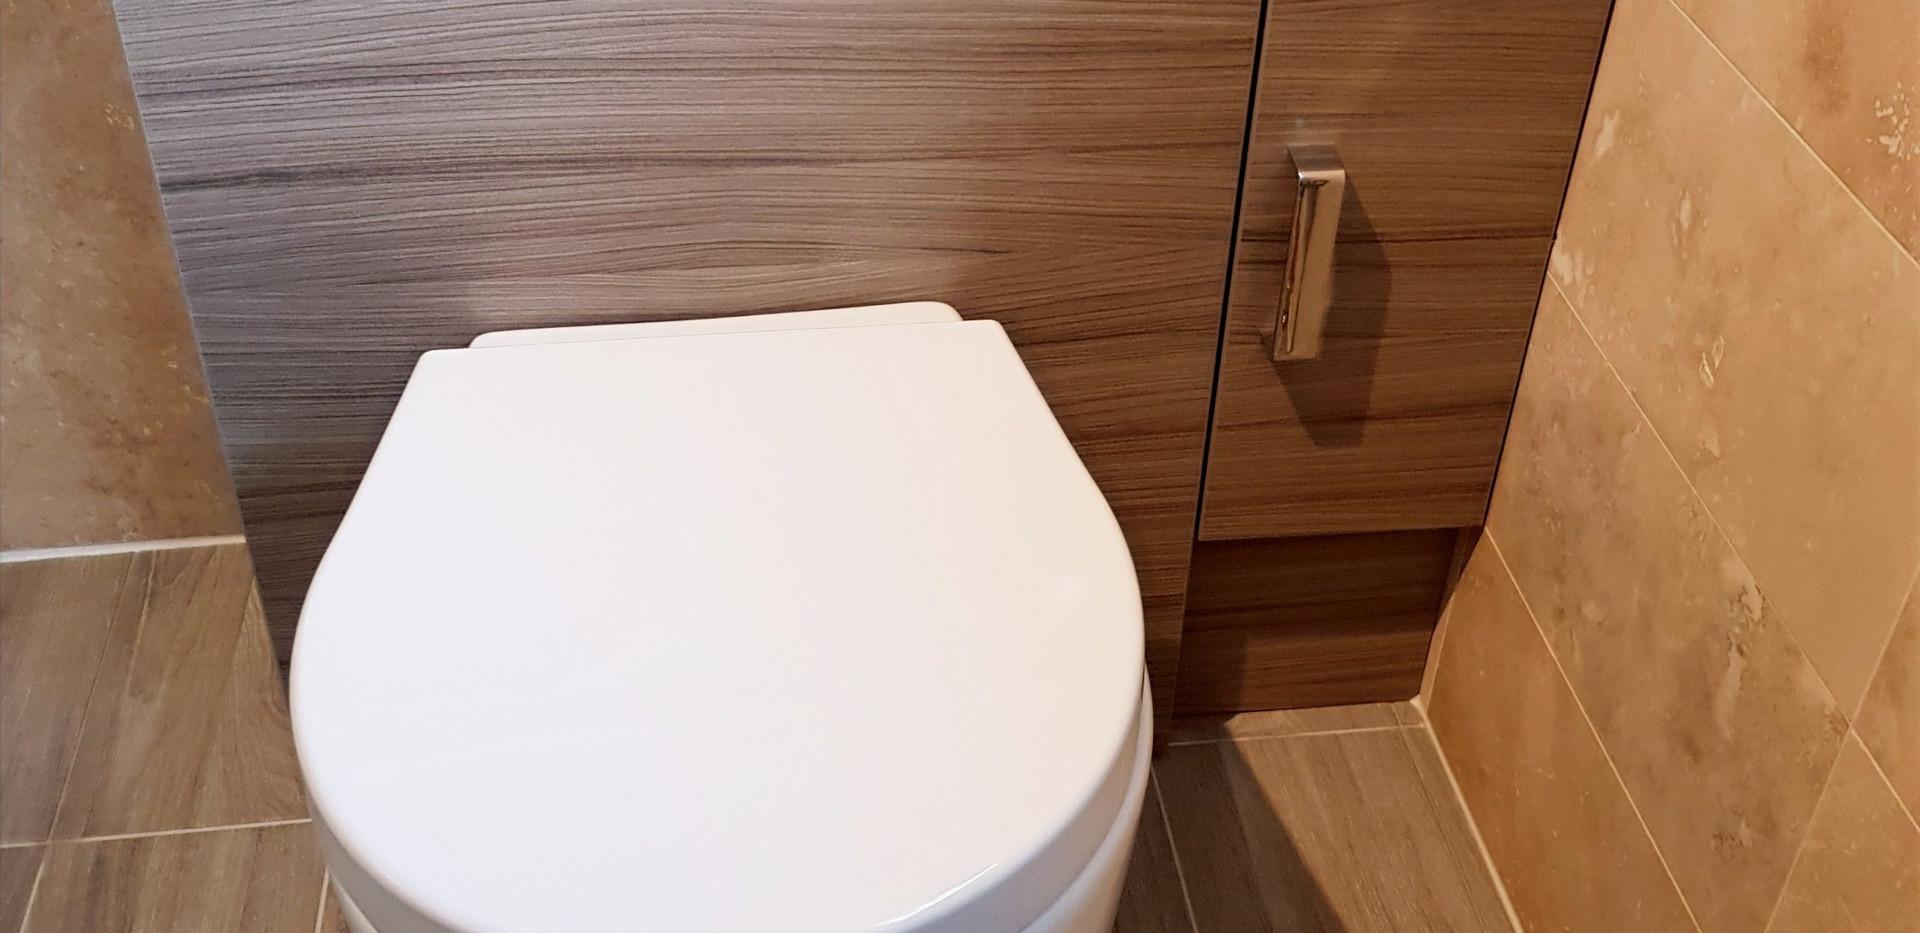 Toilet unit tiling flooring